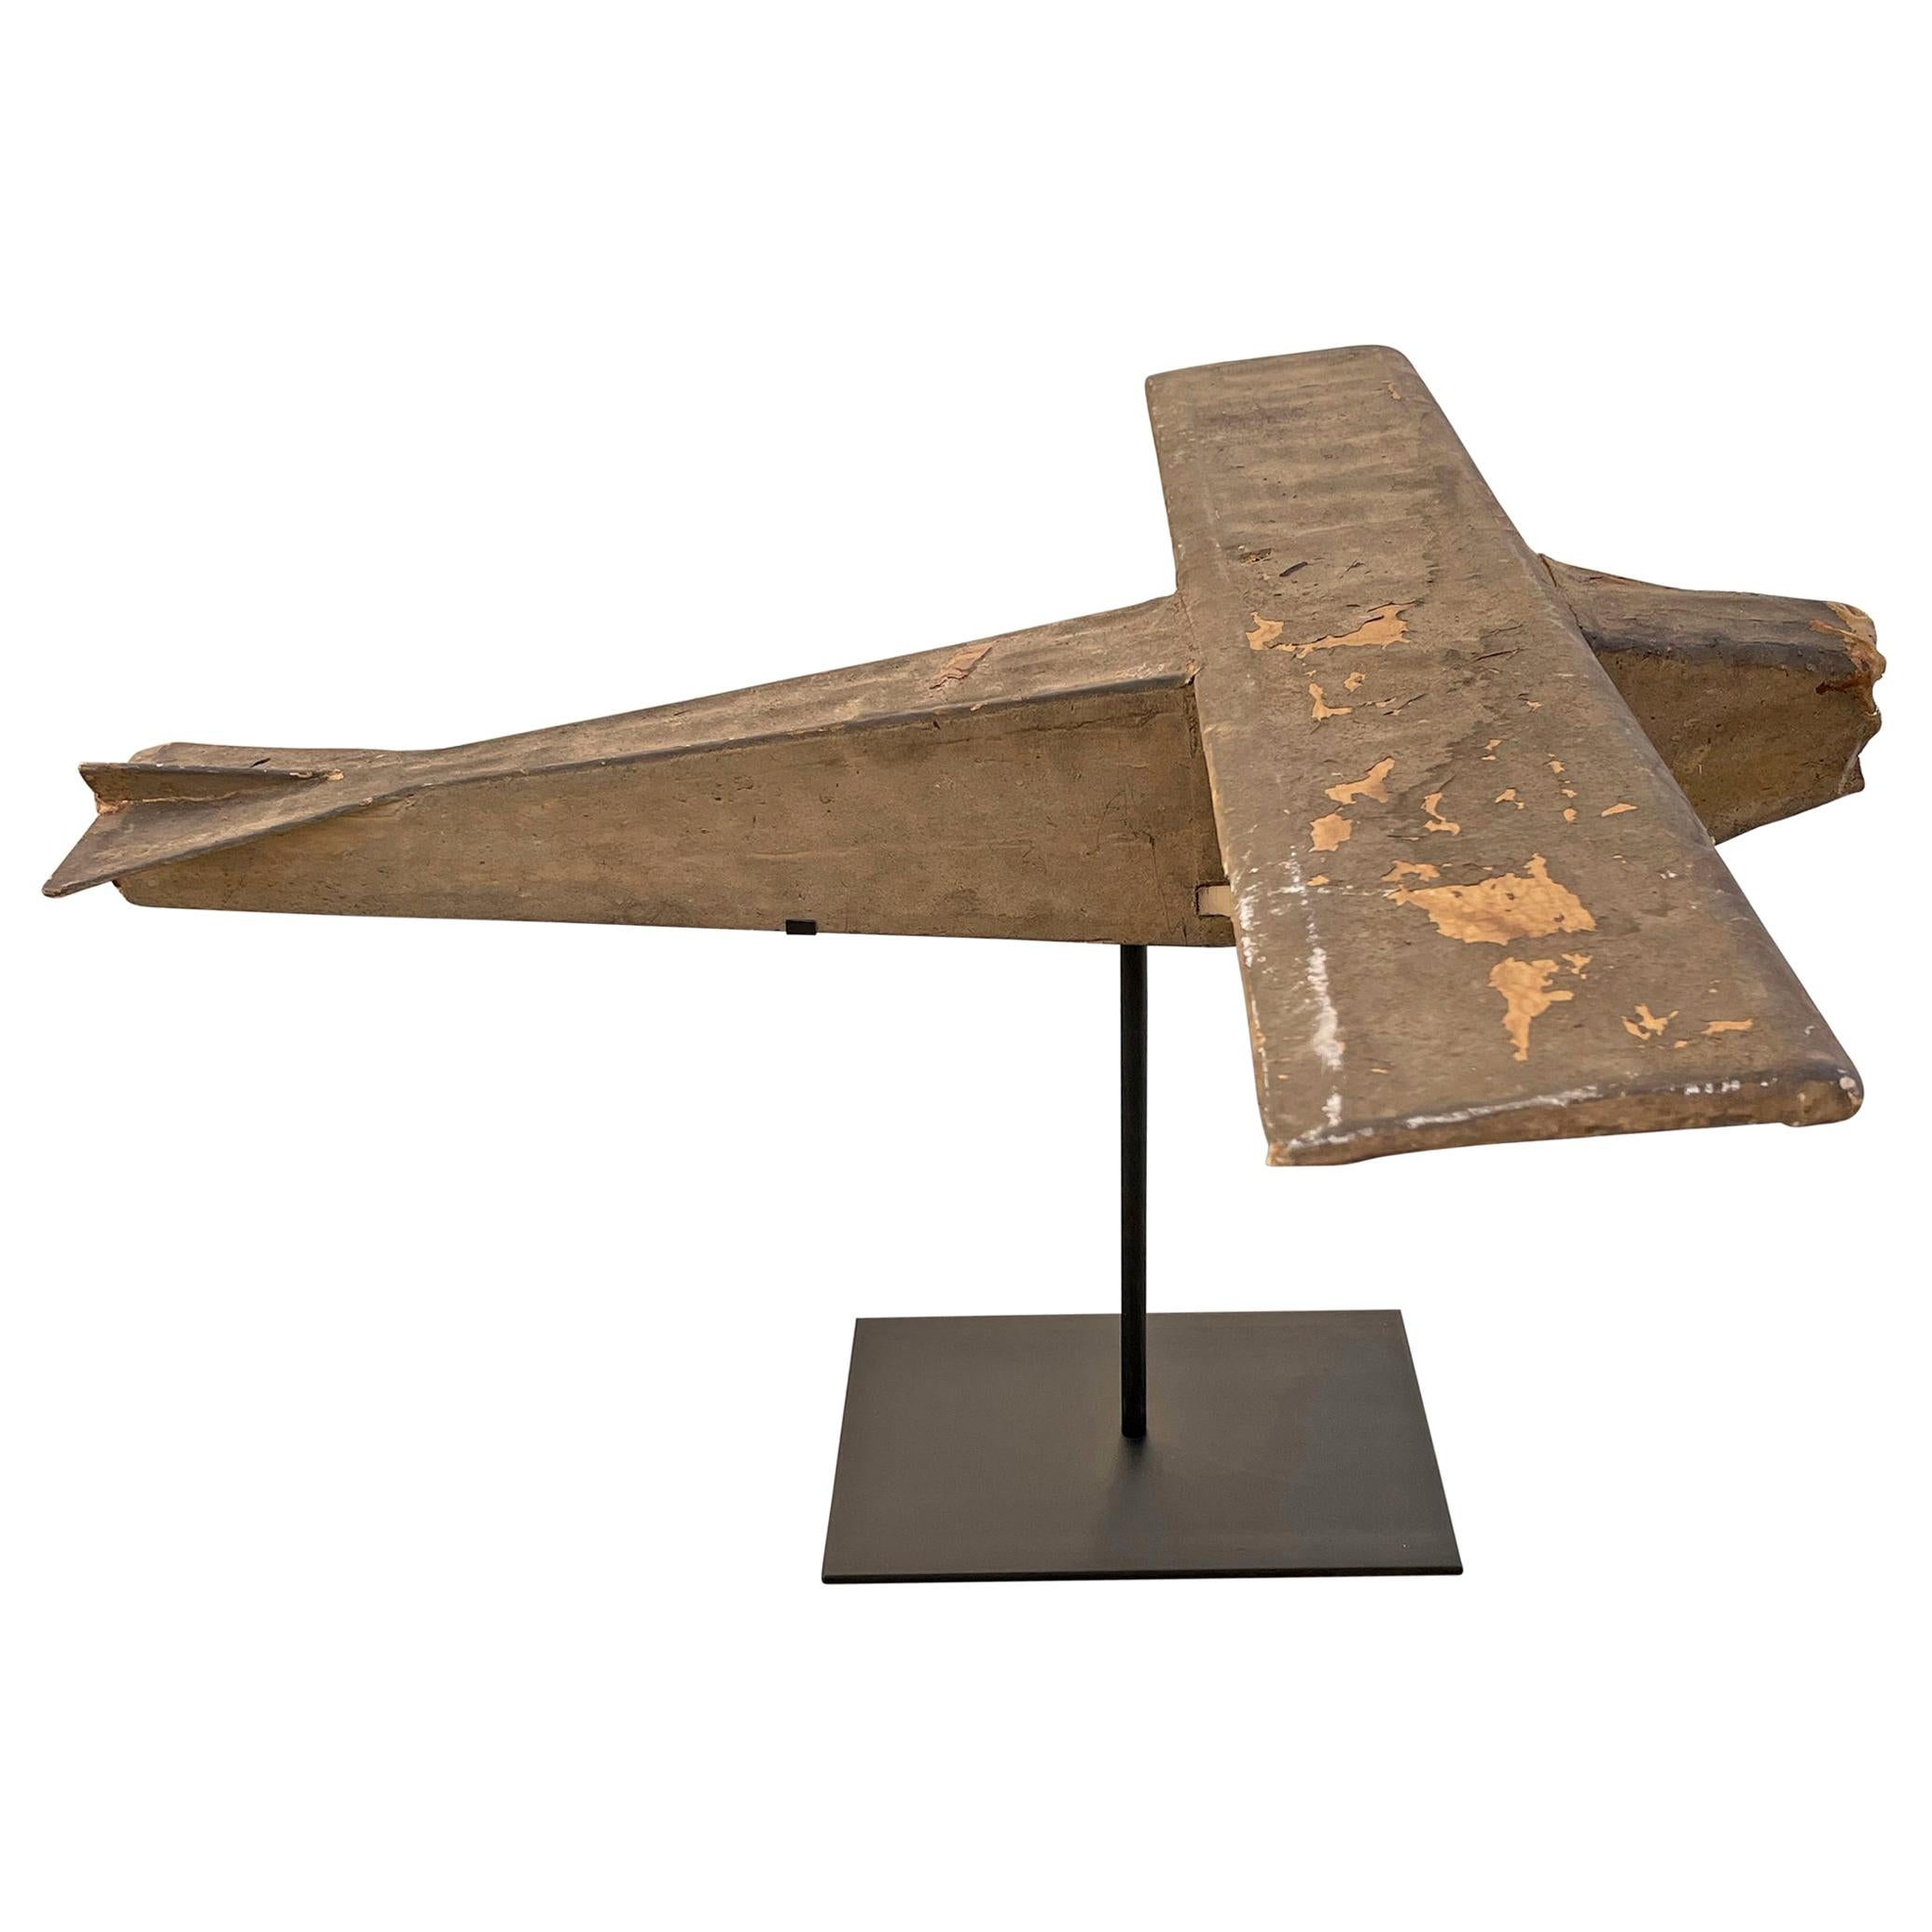 Early 20th Century American Folk Art Bush Plane Model on Custom Mount